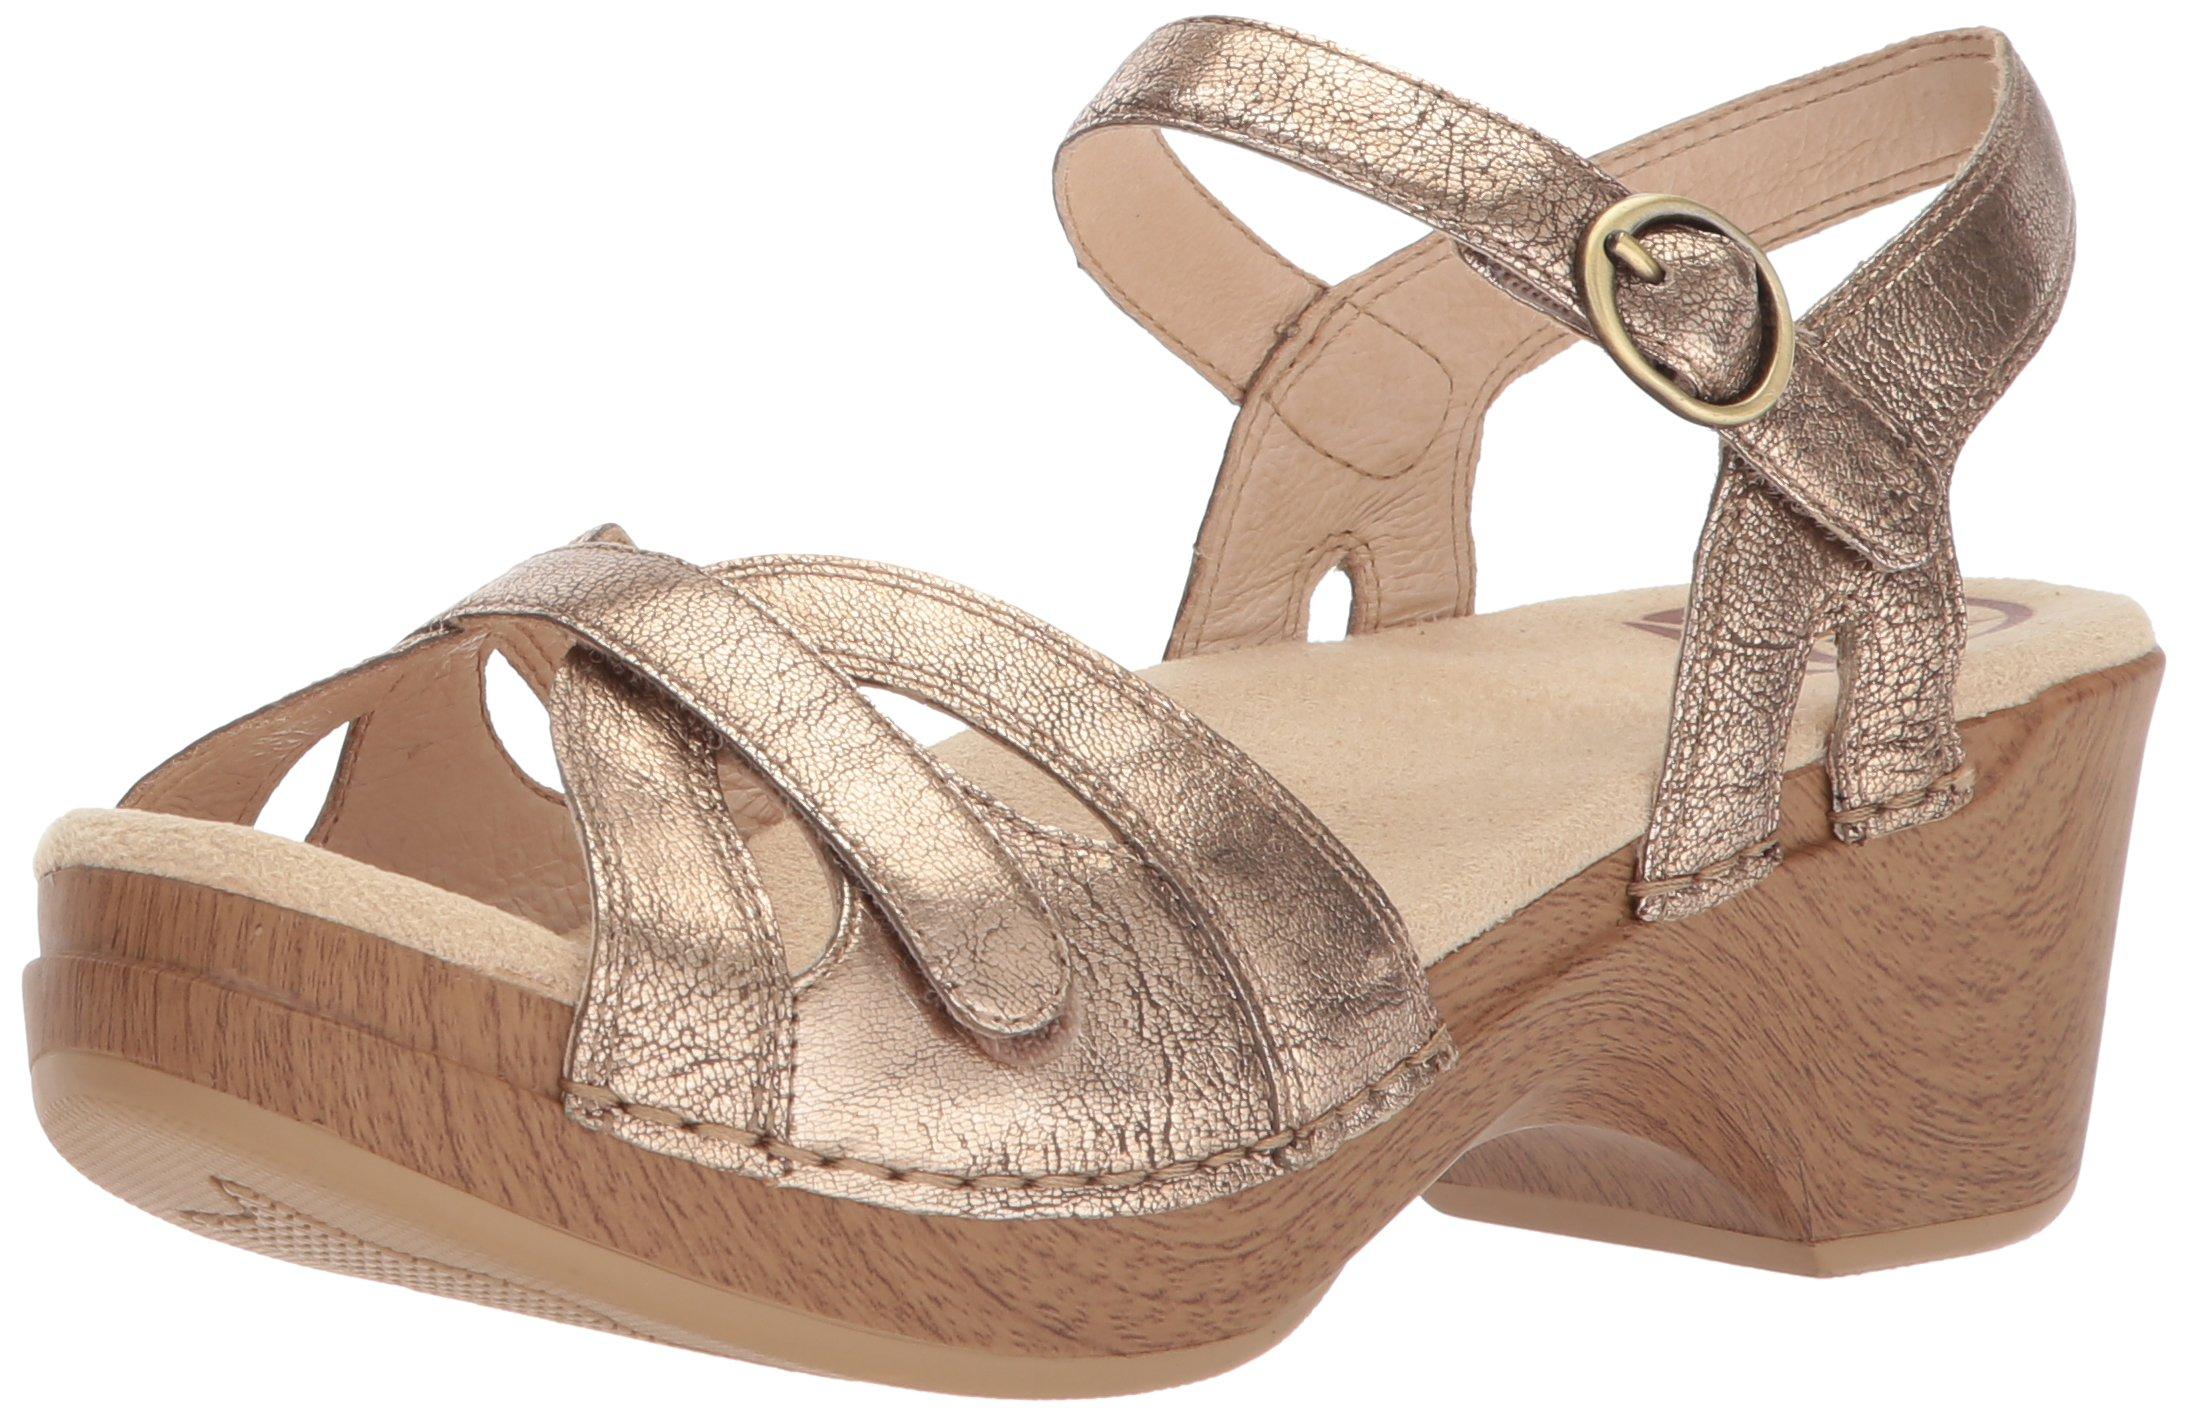 Dansko Women's Season Sandal, Gold Crinkle, 38 M EU (7.5-8 US)